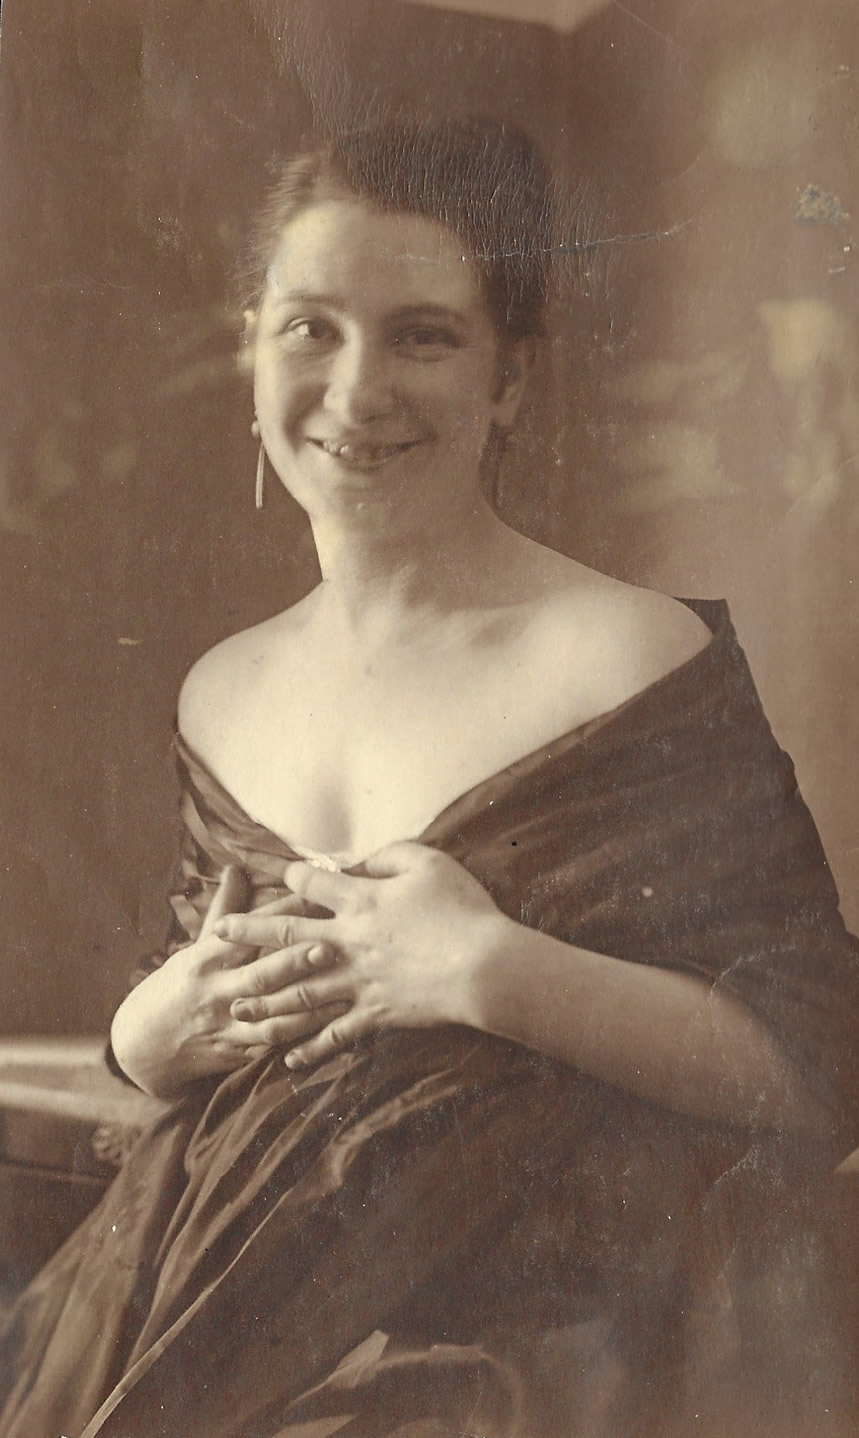 Lette Valeska, 1918, Copyright of Julia Hammid and the Estate of Tino Hammid